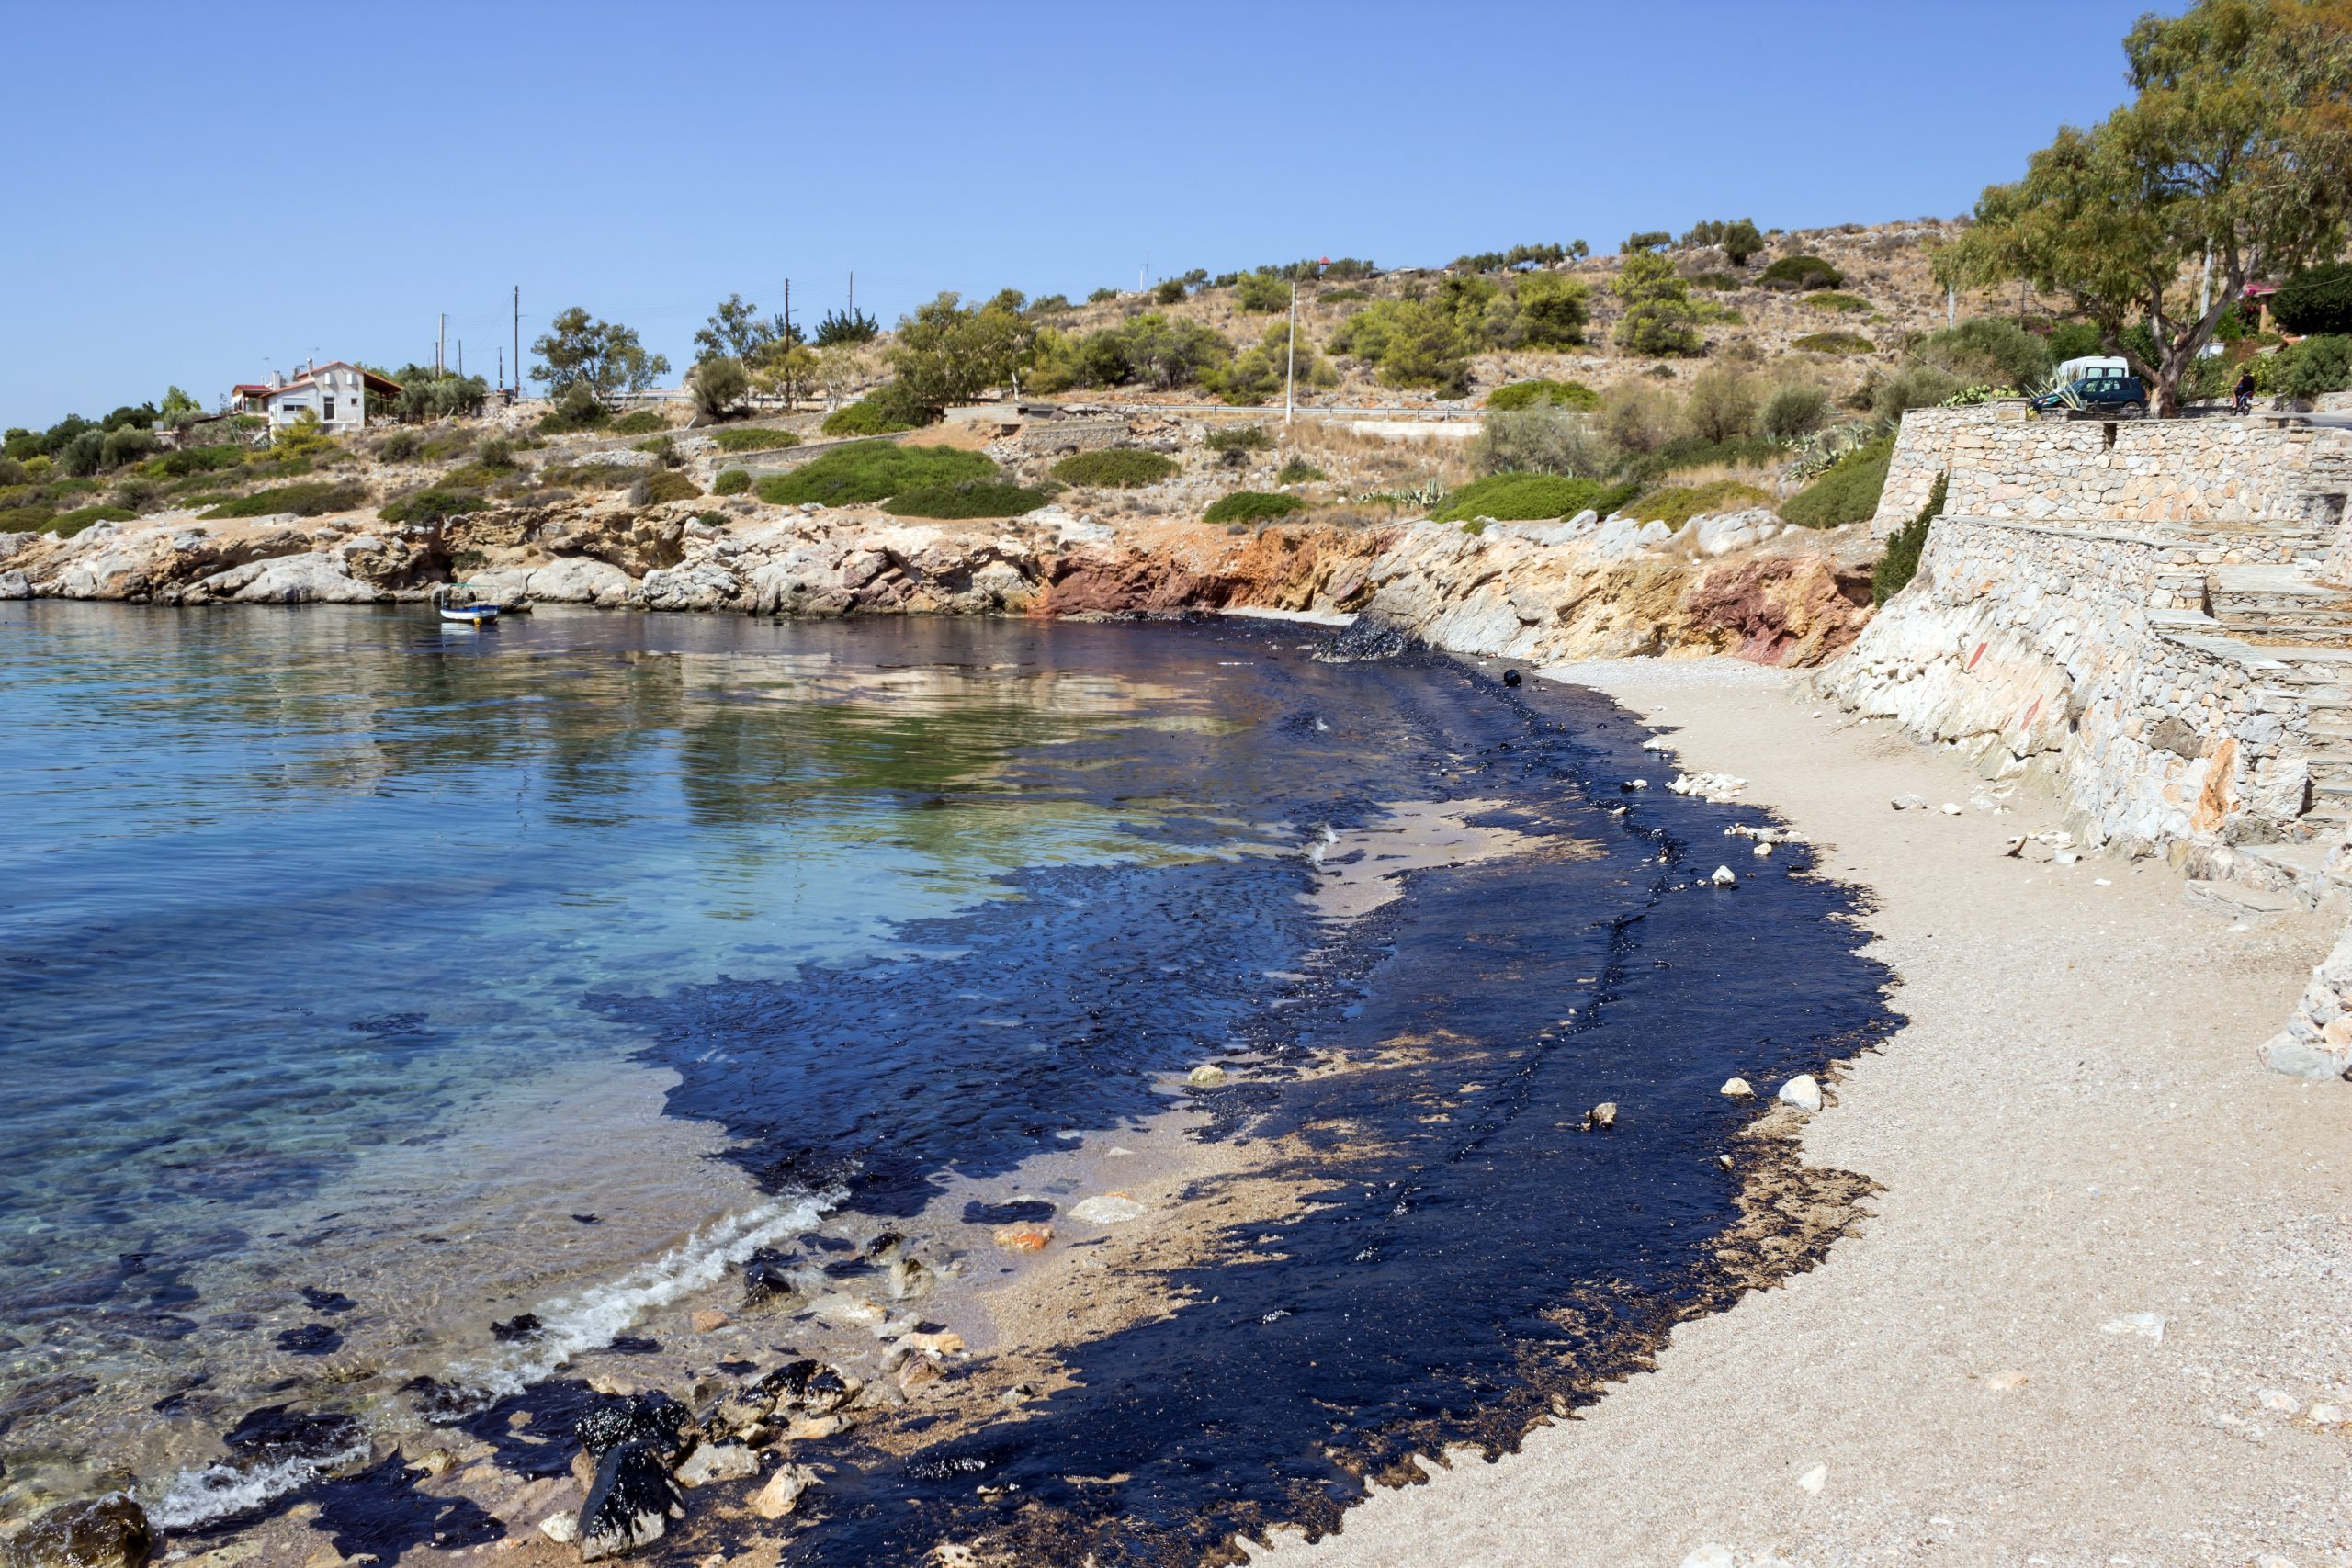 Minami Tamaki Investigating Huntington Beach Oil Spill